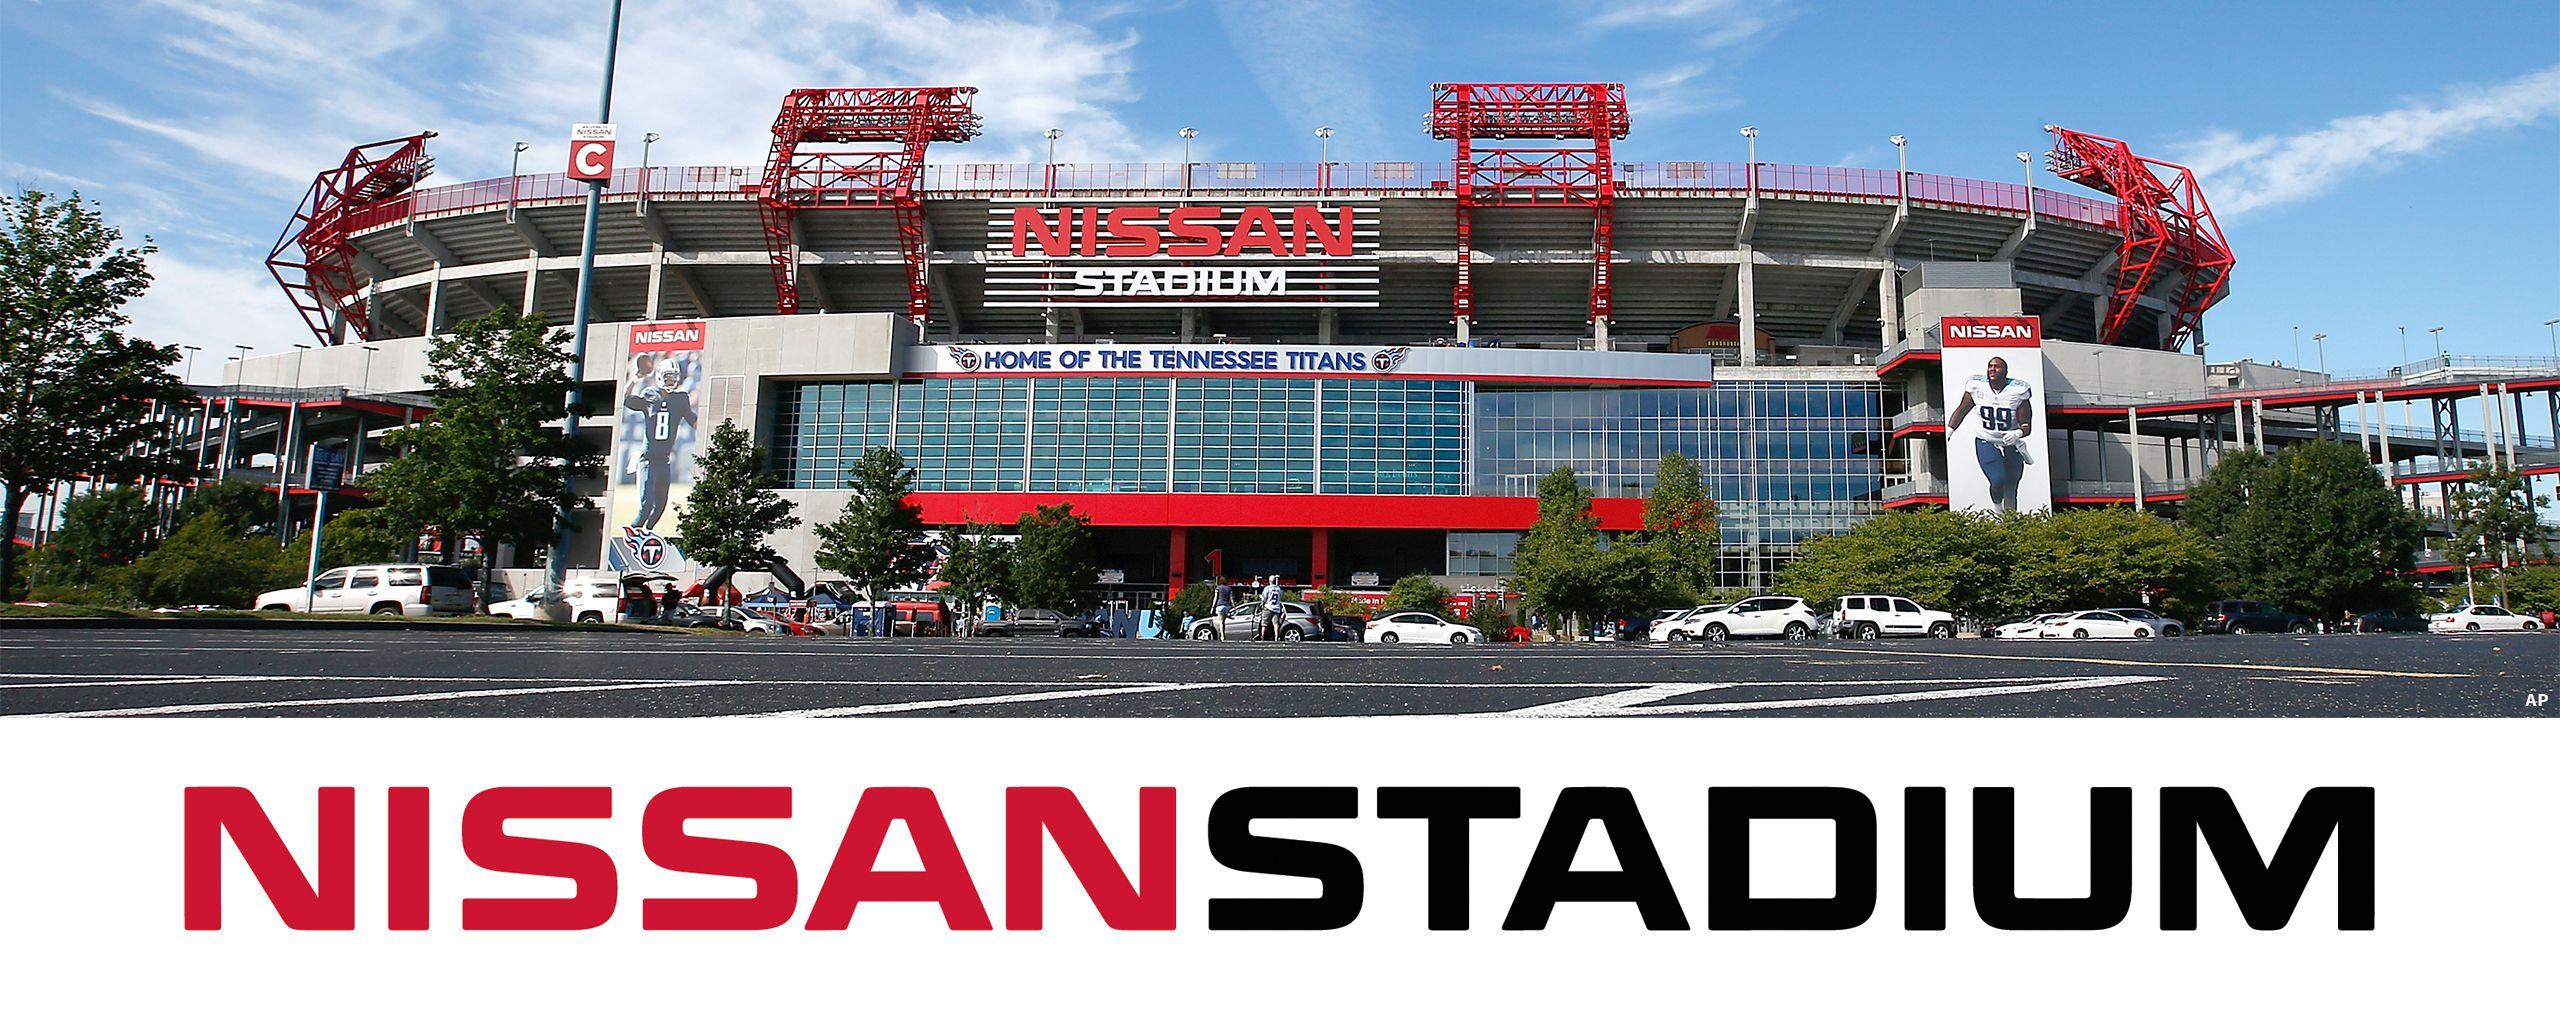 NissanStadium.com